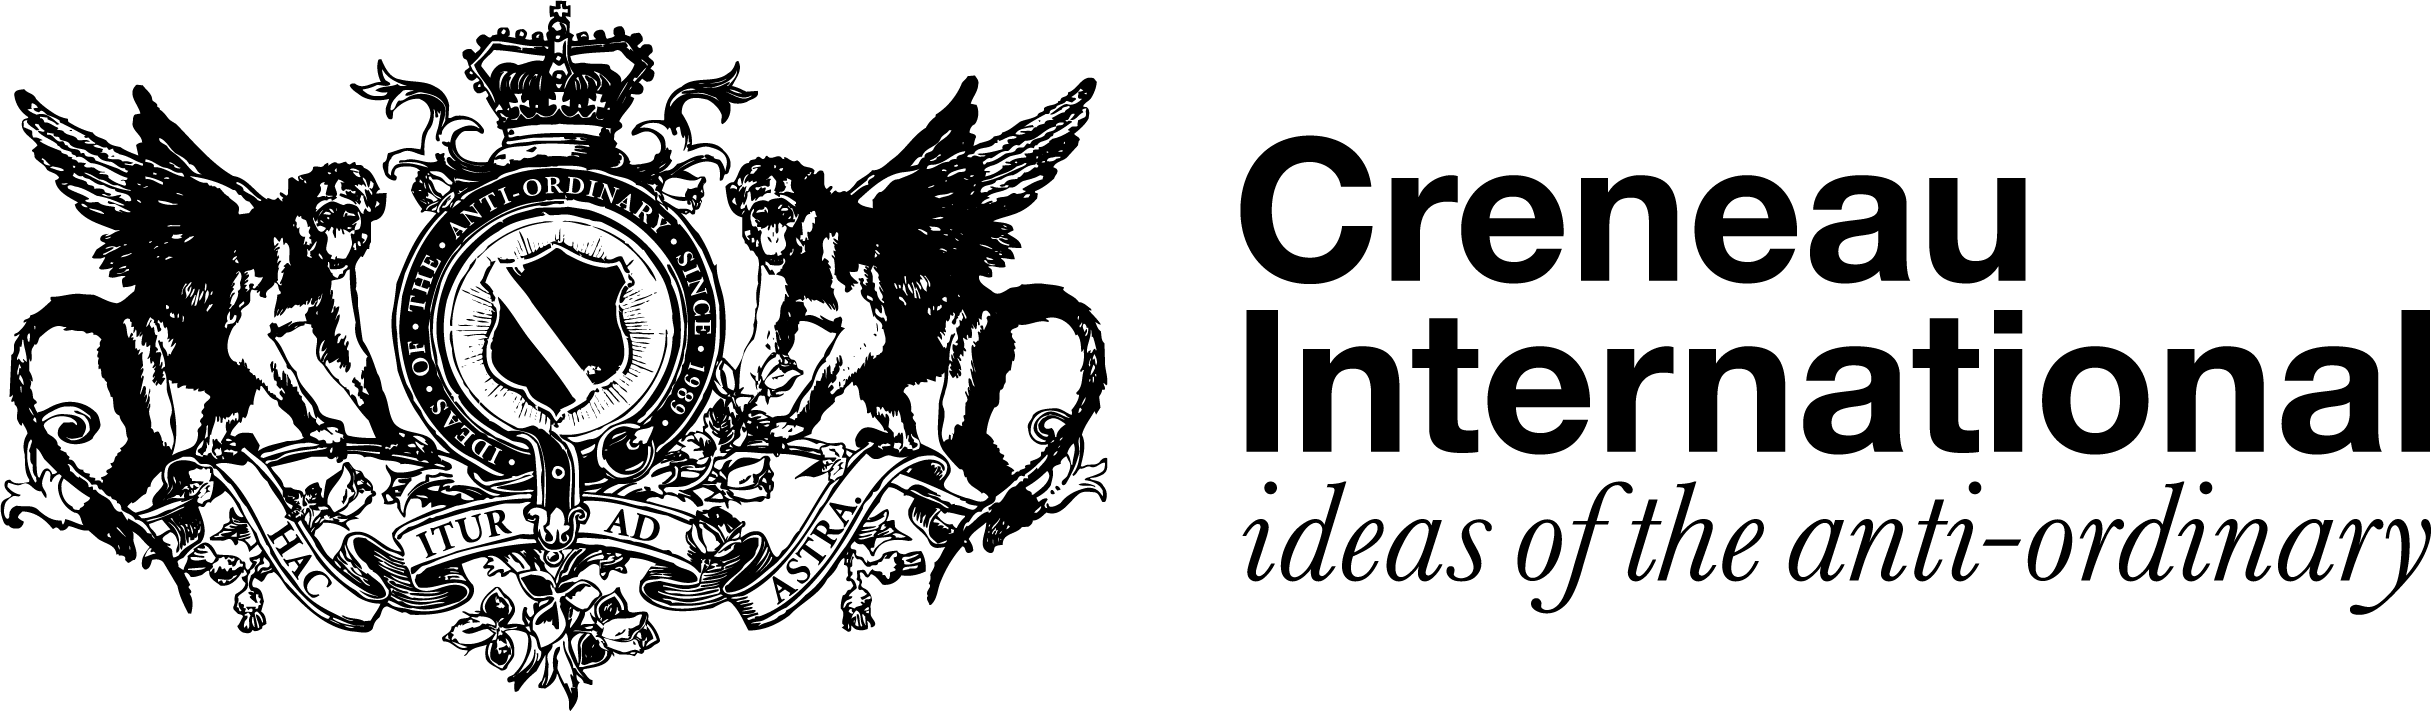 Logo klant van White Light: Creneau International